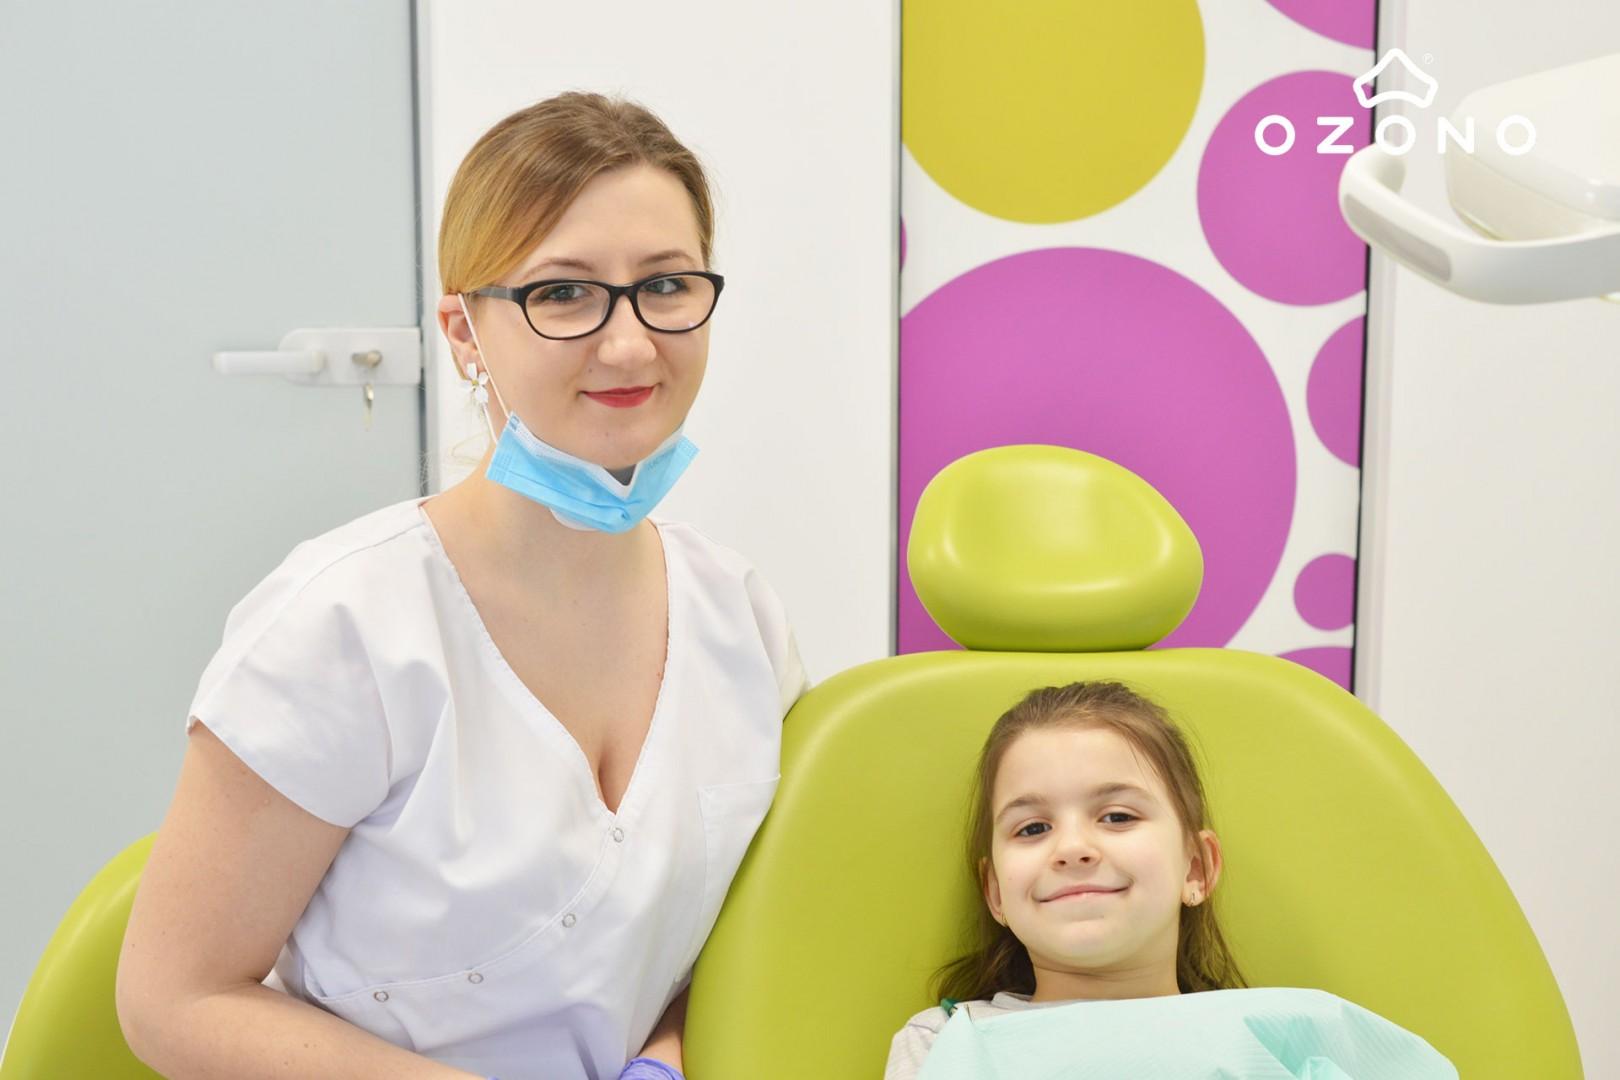 Prima vizită la stomatolog a copilului  | Echipa OZONO